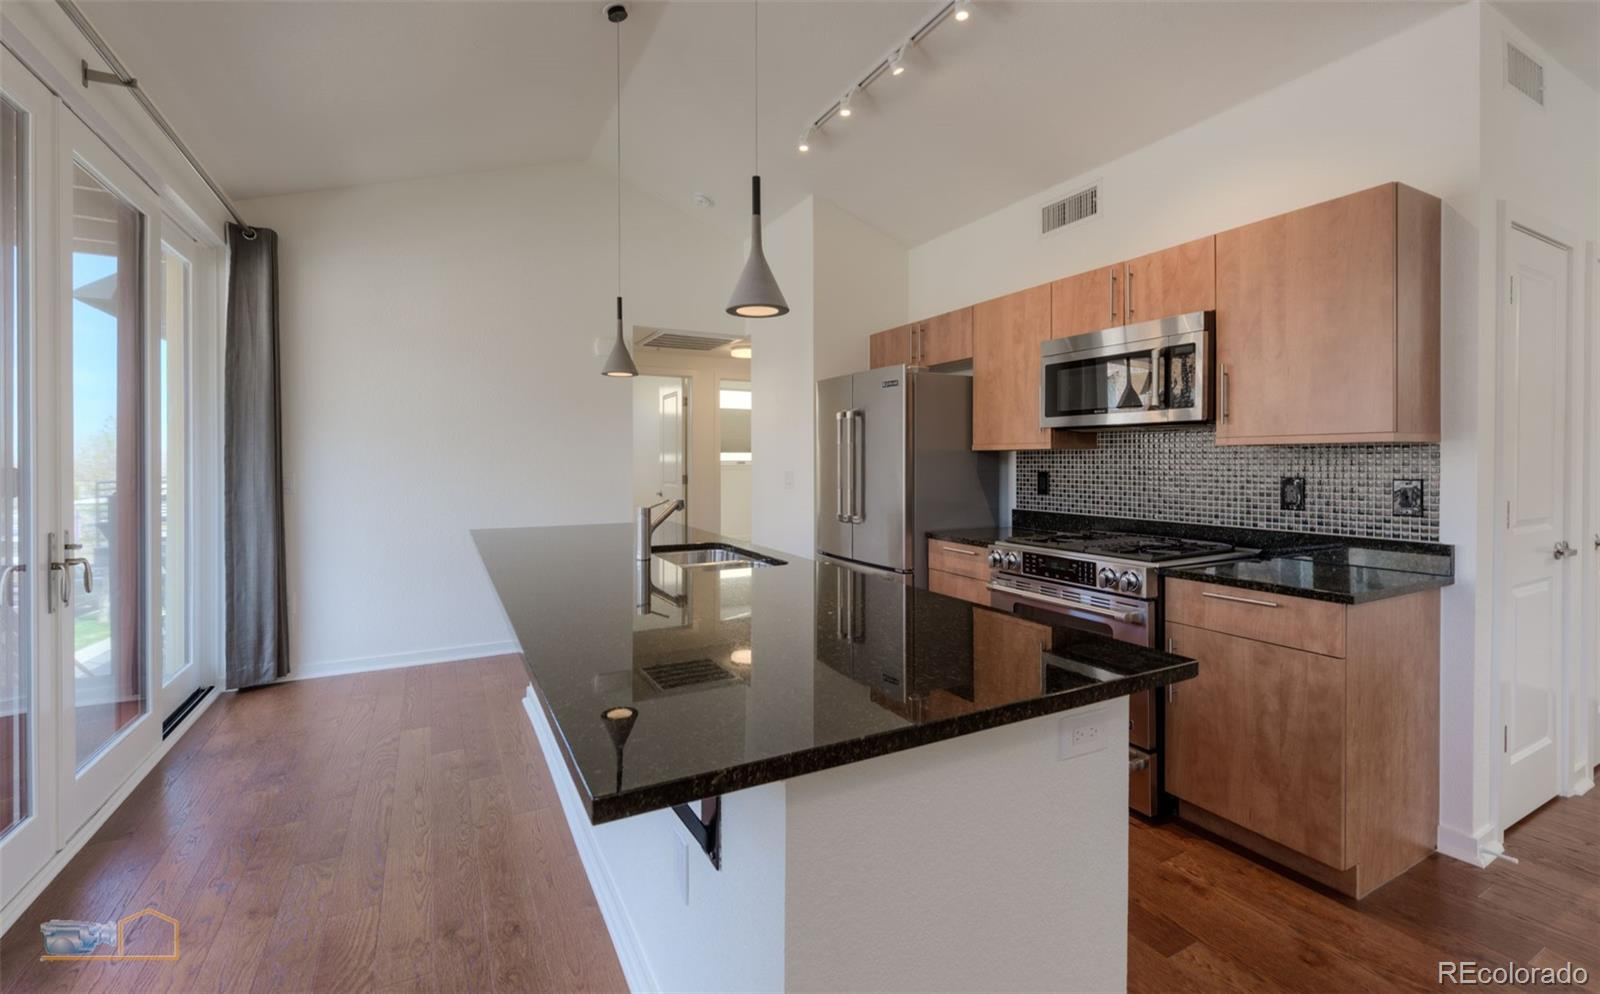 MLS# 8253378 - 8 - 1350 Rosewood Avenue, Boulder, CO 80304